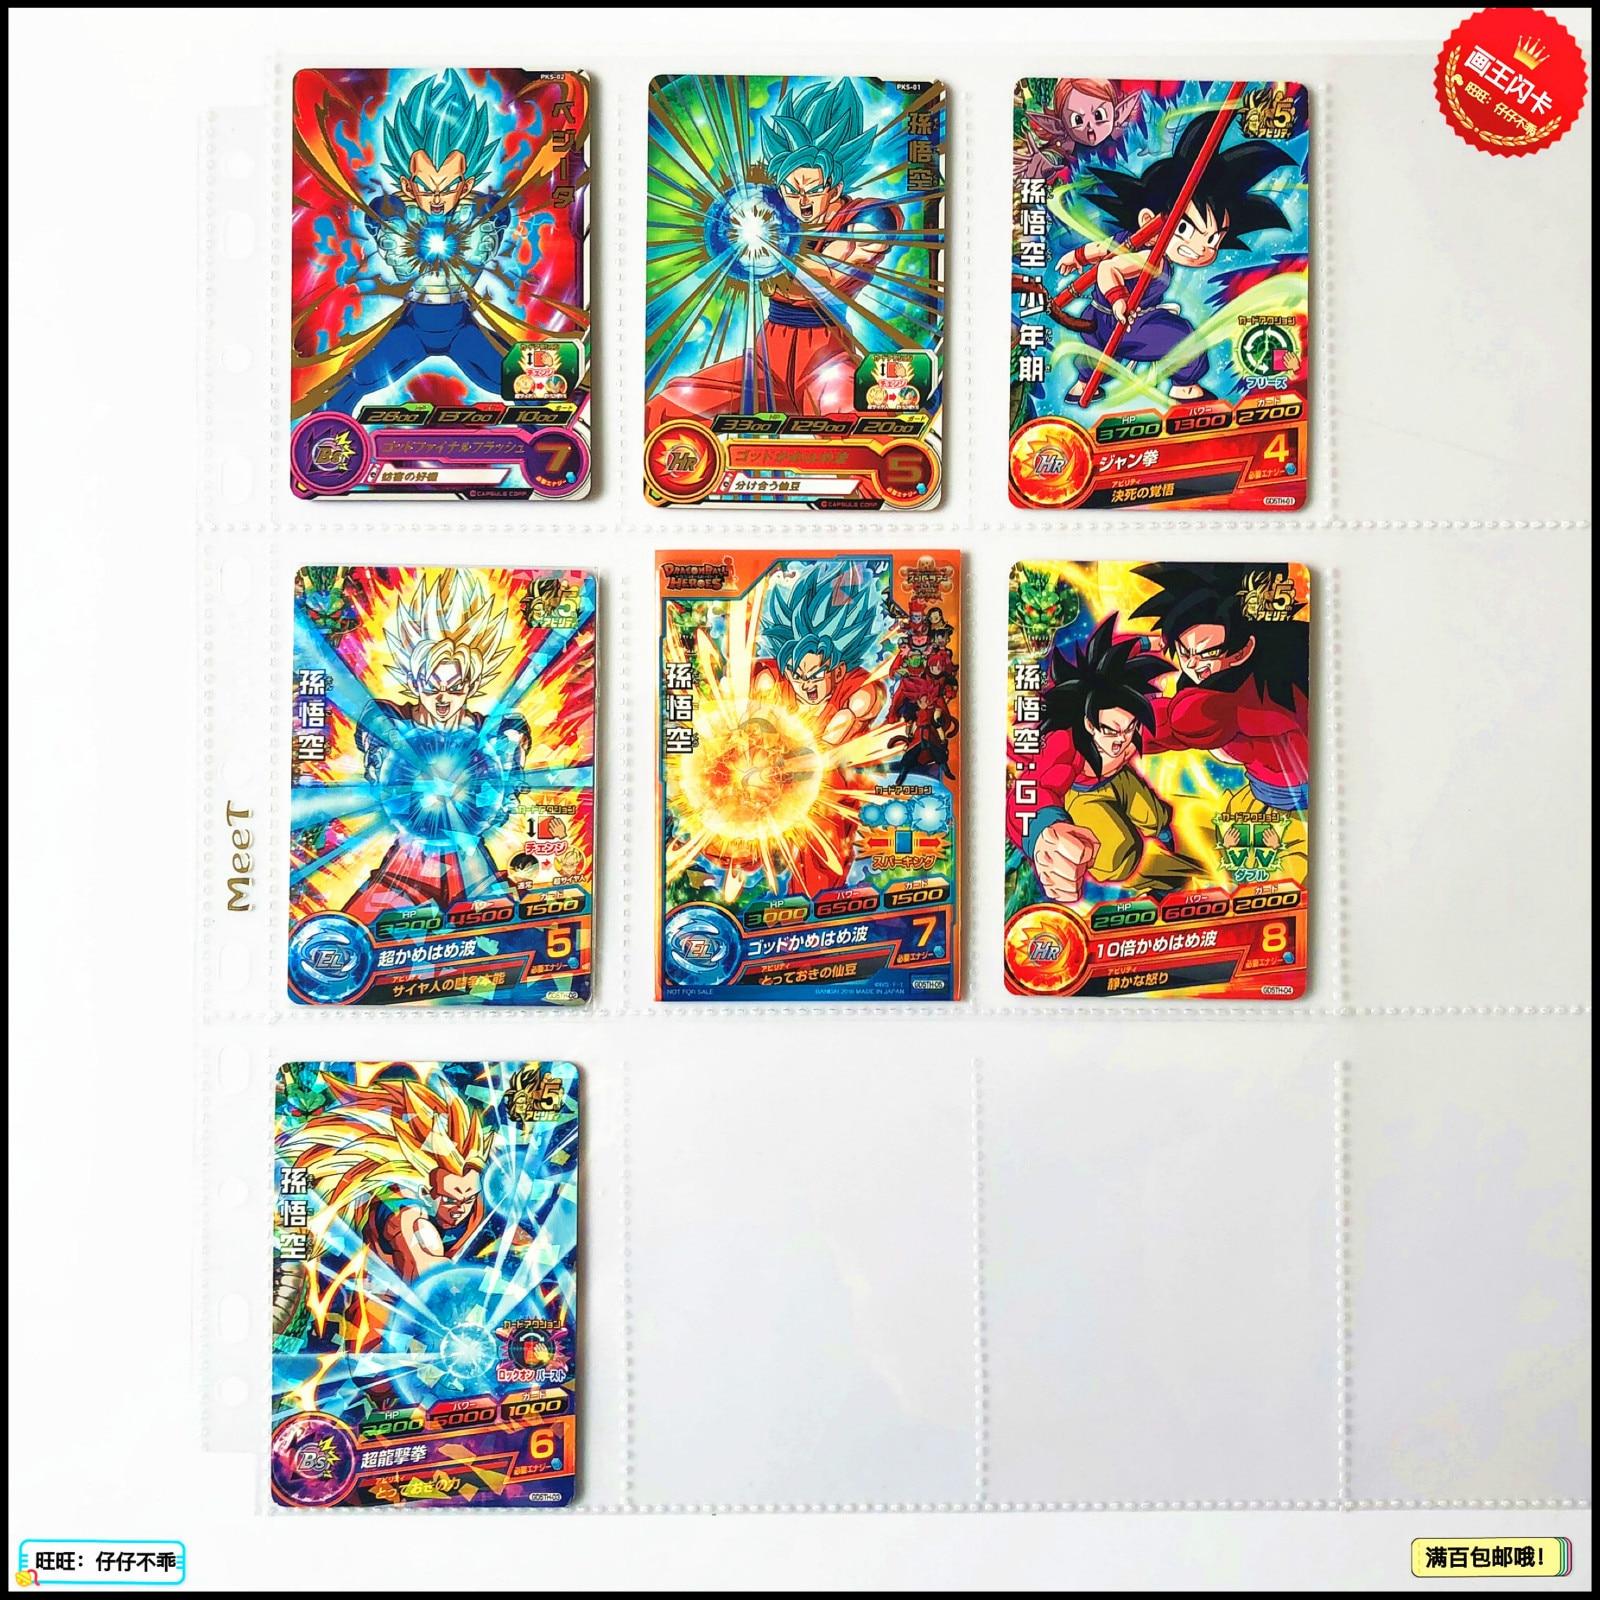 Japan Original Dragon Ball Hero Card GD5TH Goku Toys Hobbies Collectibles Game Collection Anime Cards